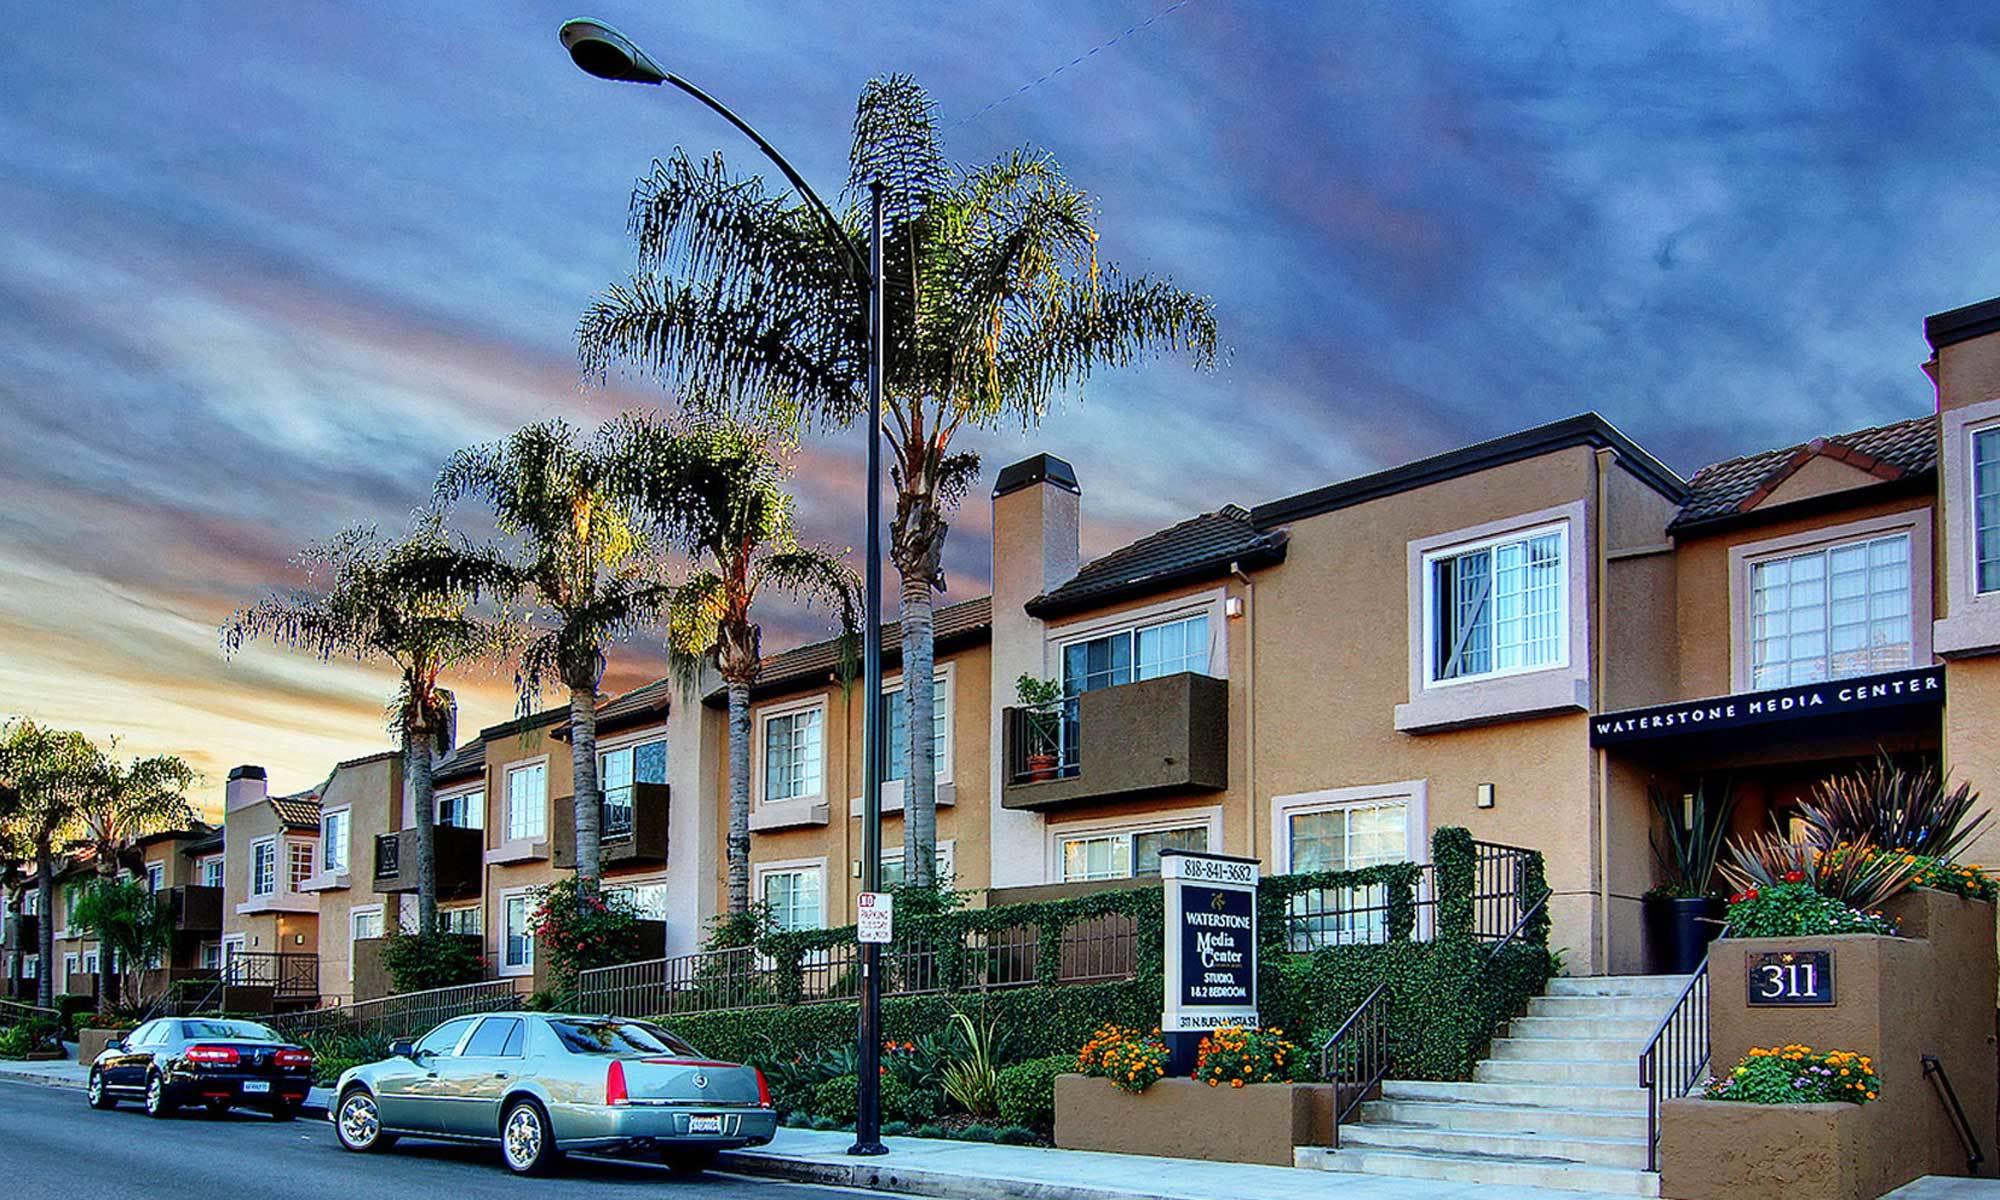 Burbank Ca Apartments For Rent Near Magnolia Park Waterstone Media Center